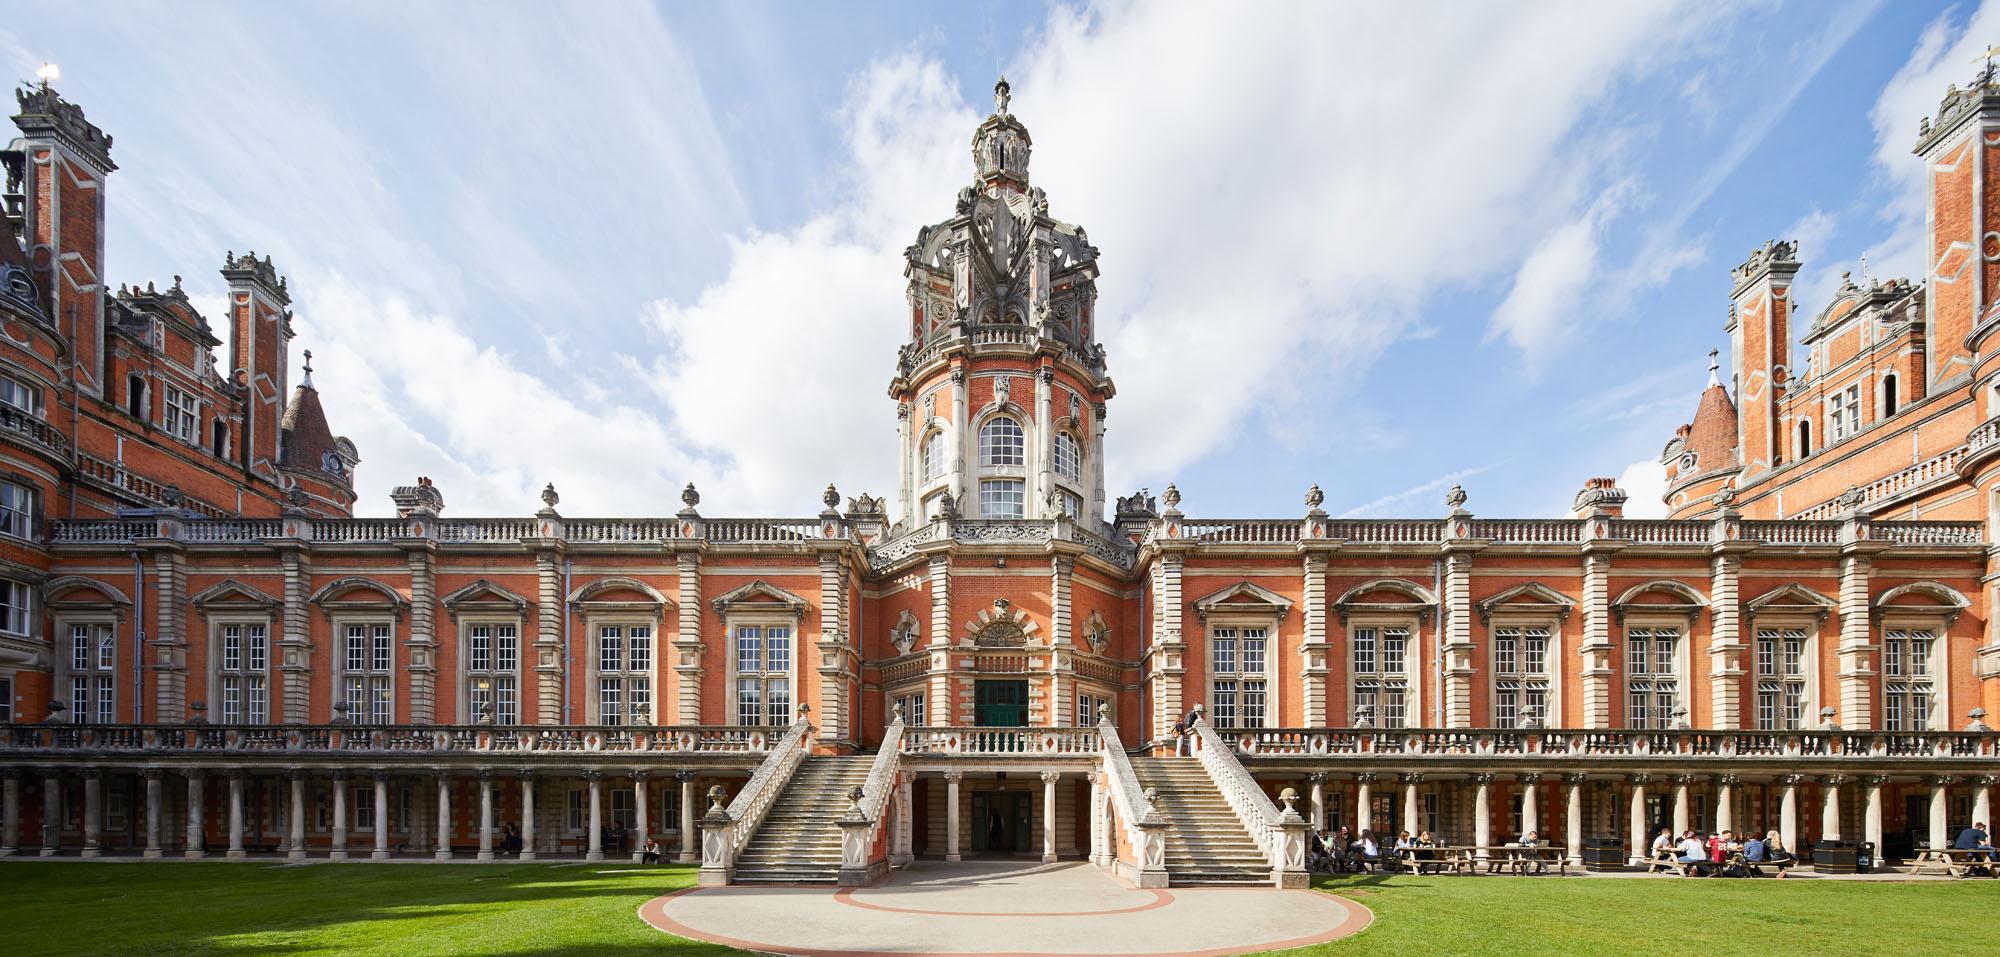 Colorminium Project Royal Holloway University